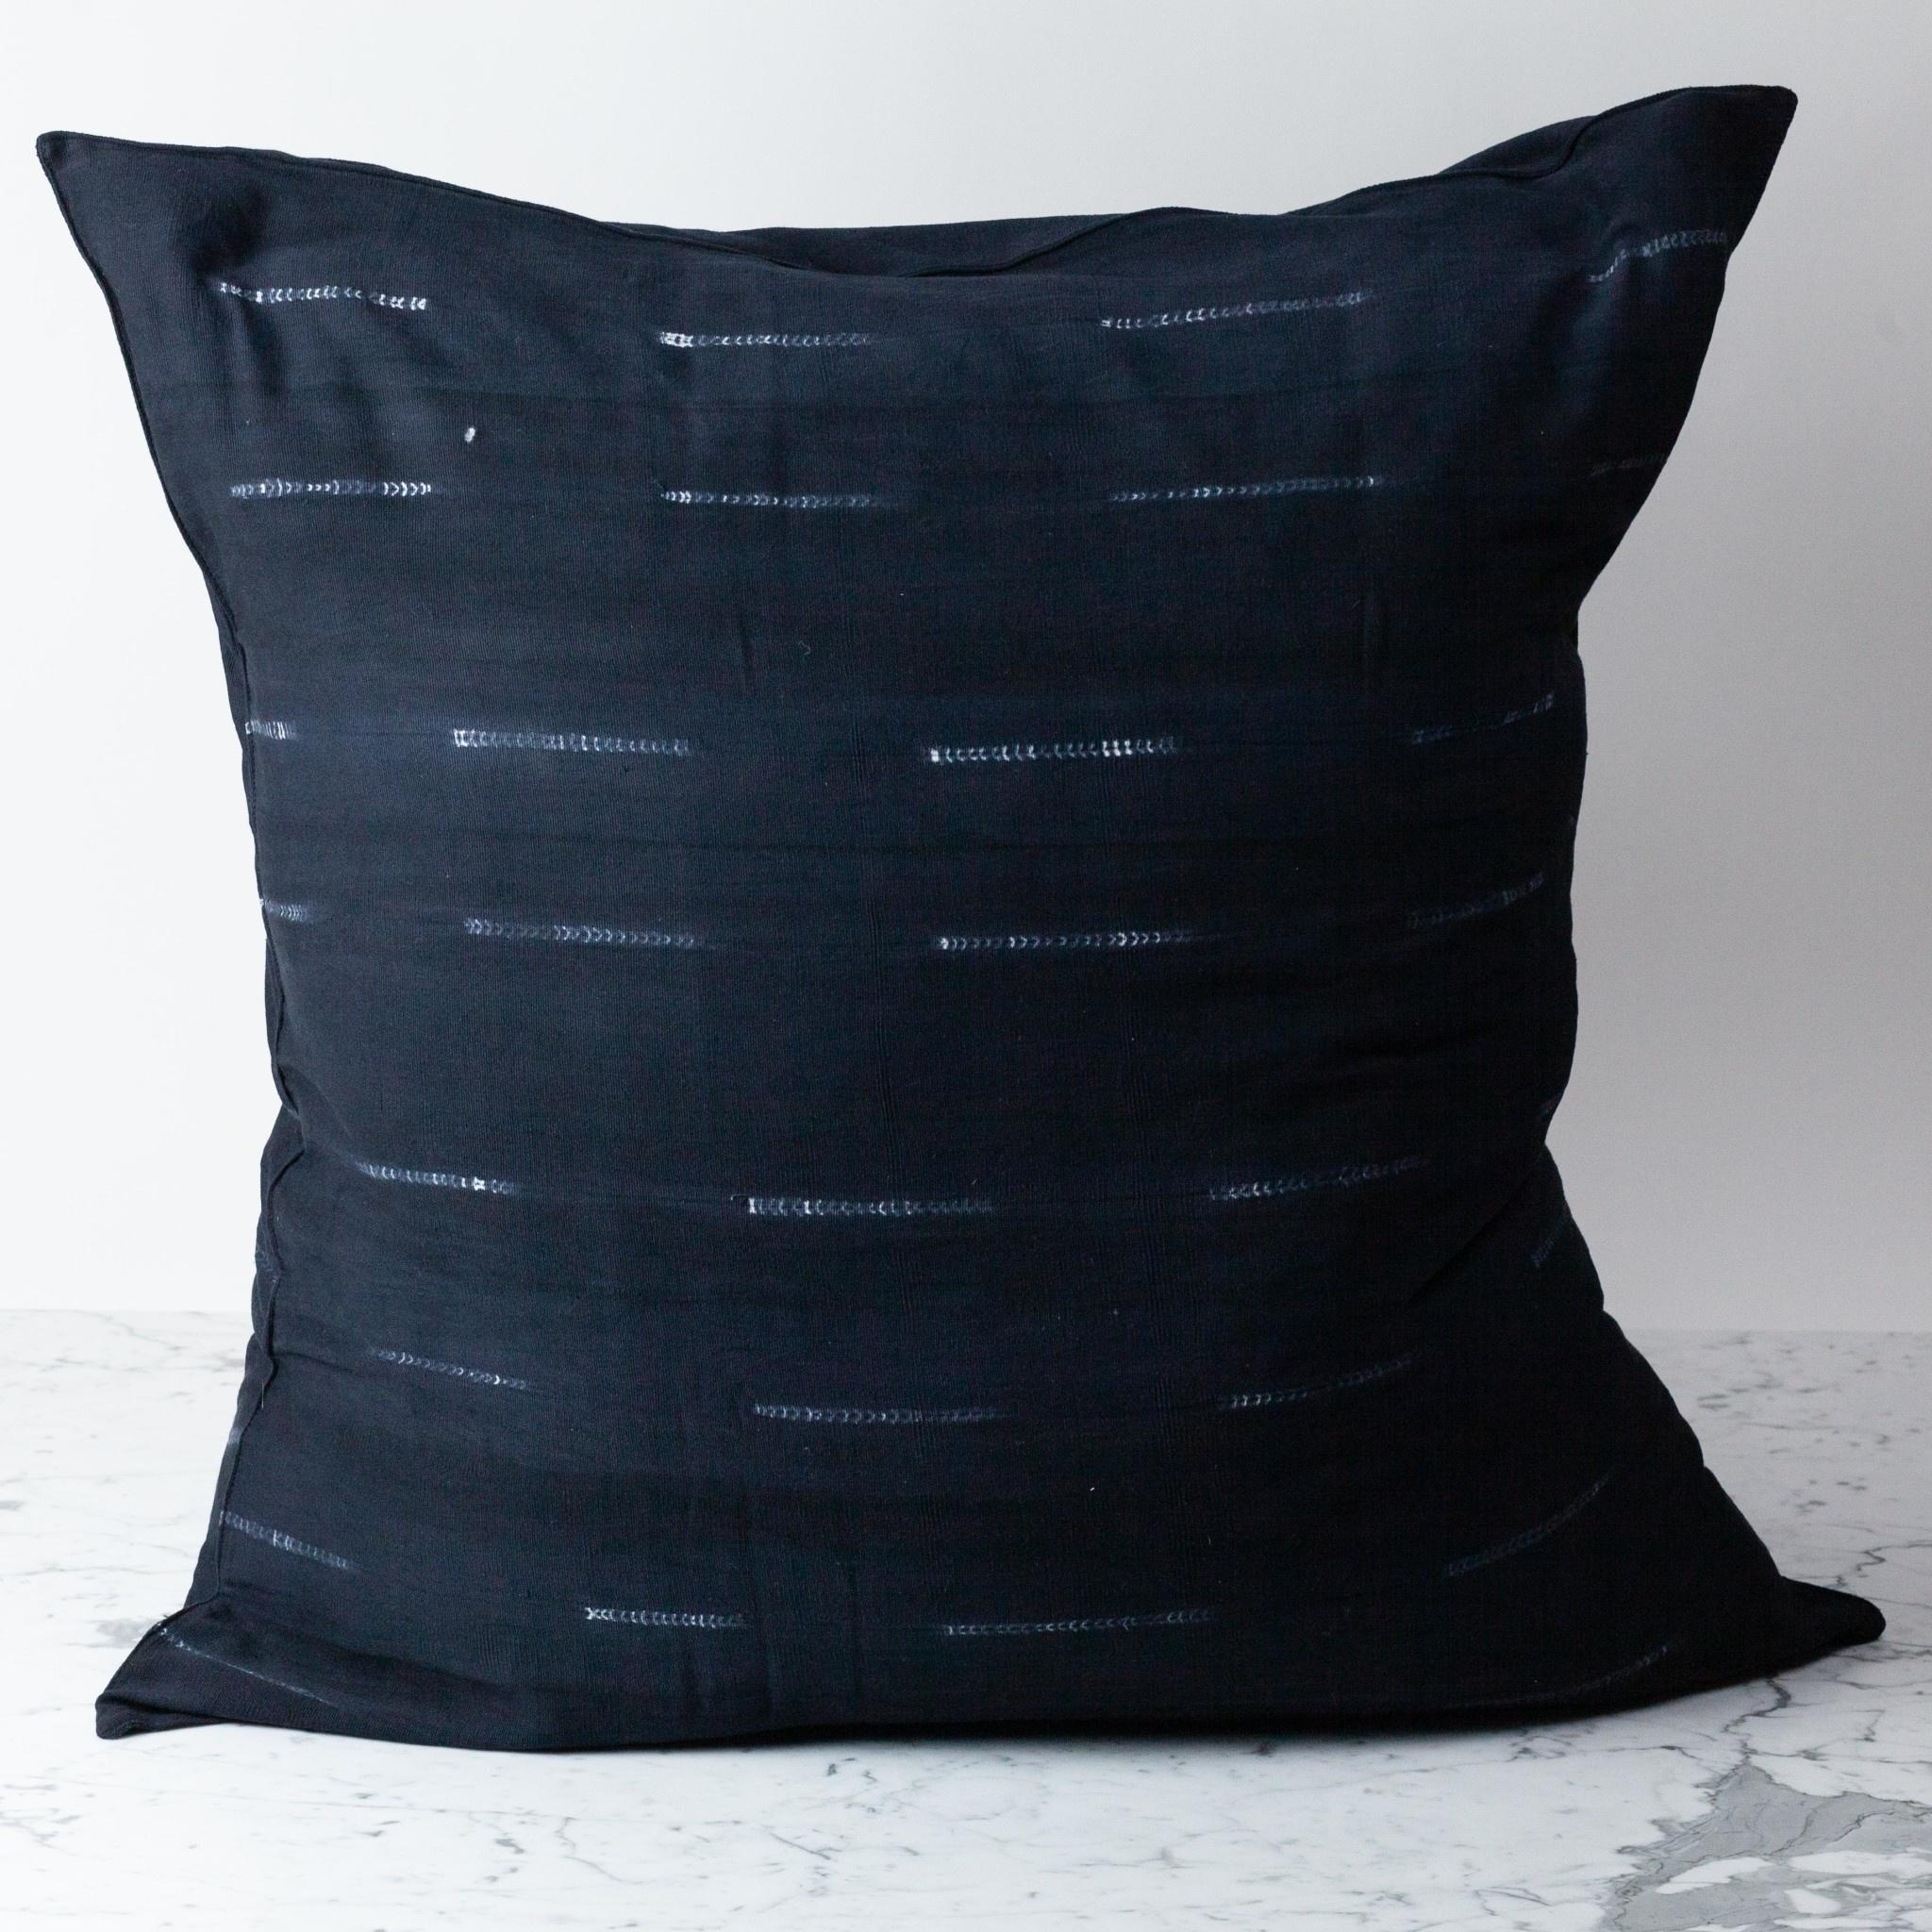 "TENSIRA 32 x 32"" Handwoven Cotton Pillow with Down Insert - Envelope Closure - Black Delicate Stitch Dye Stripe"